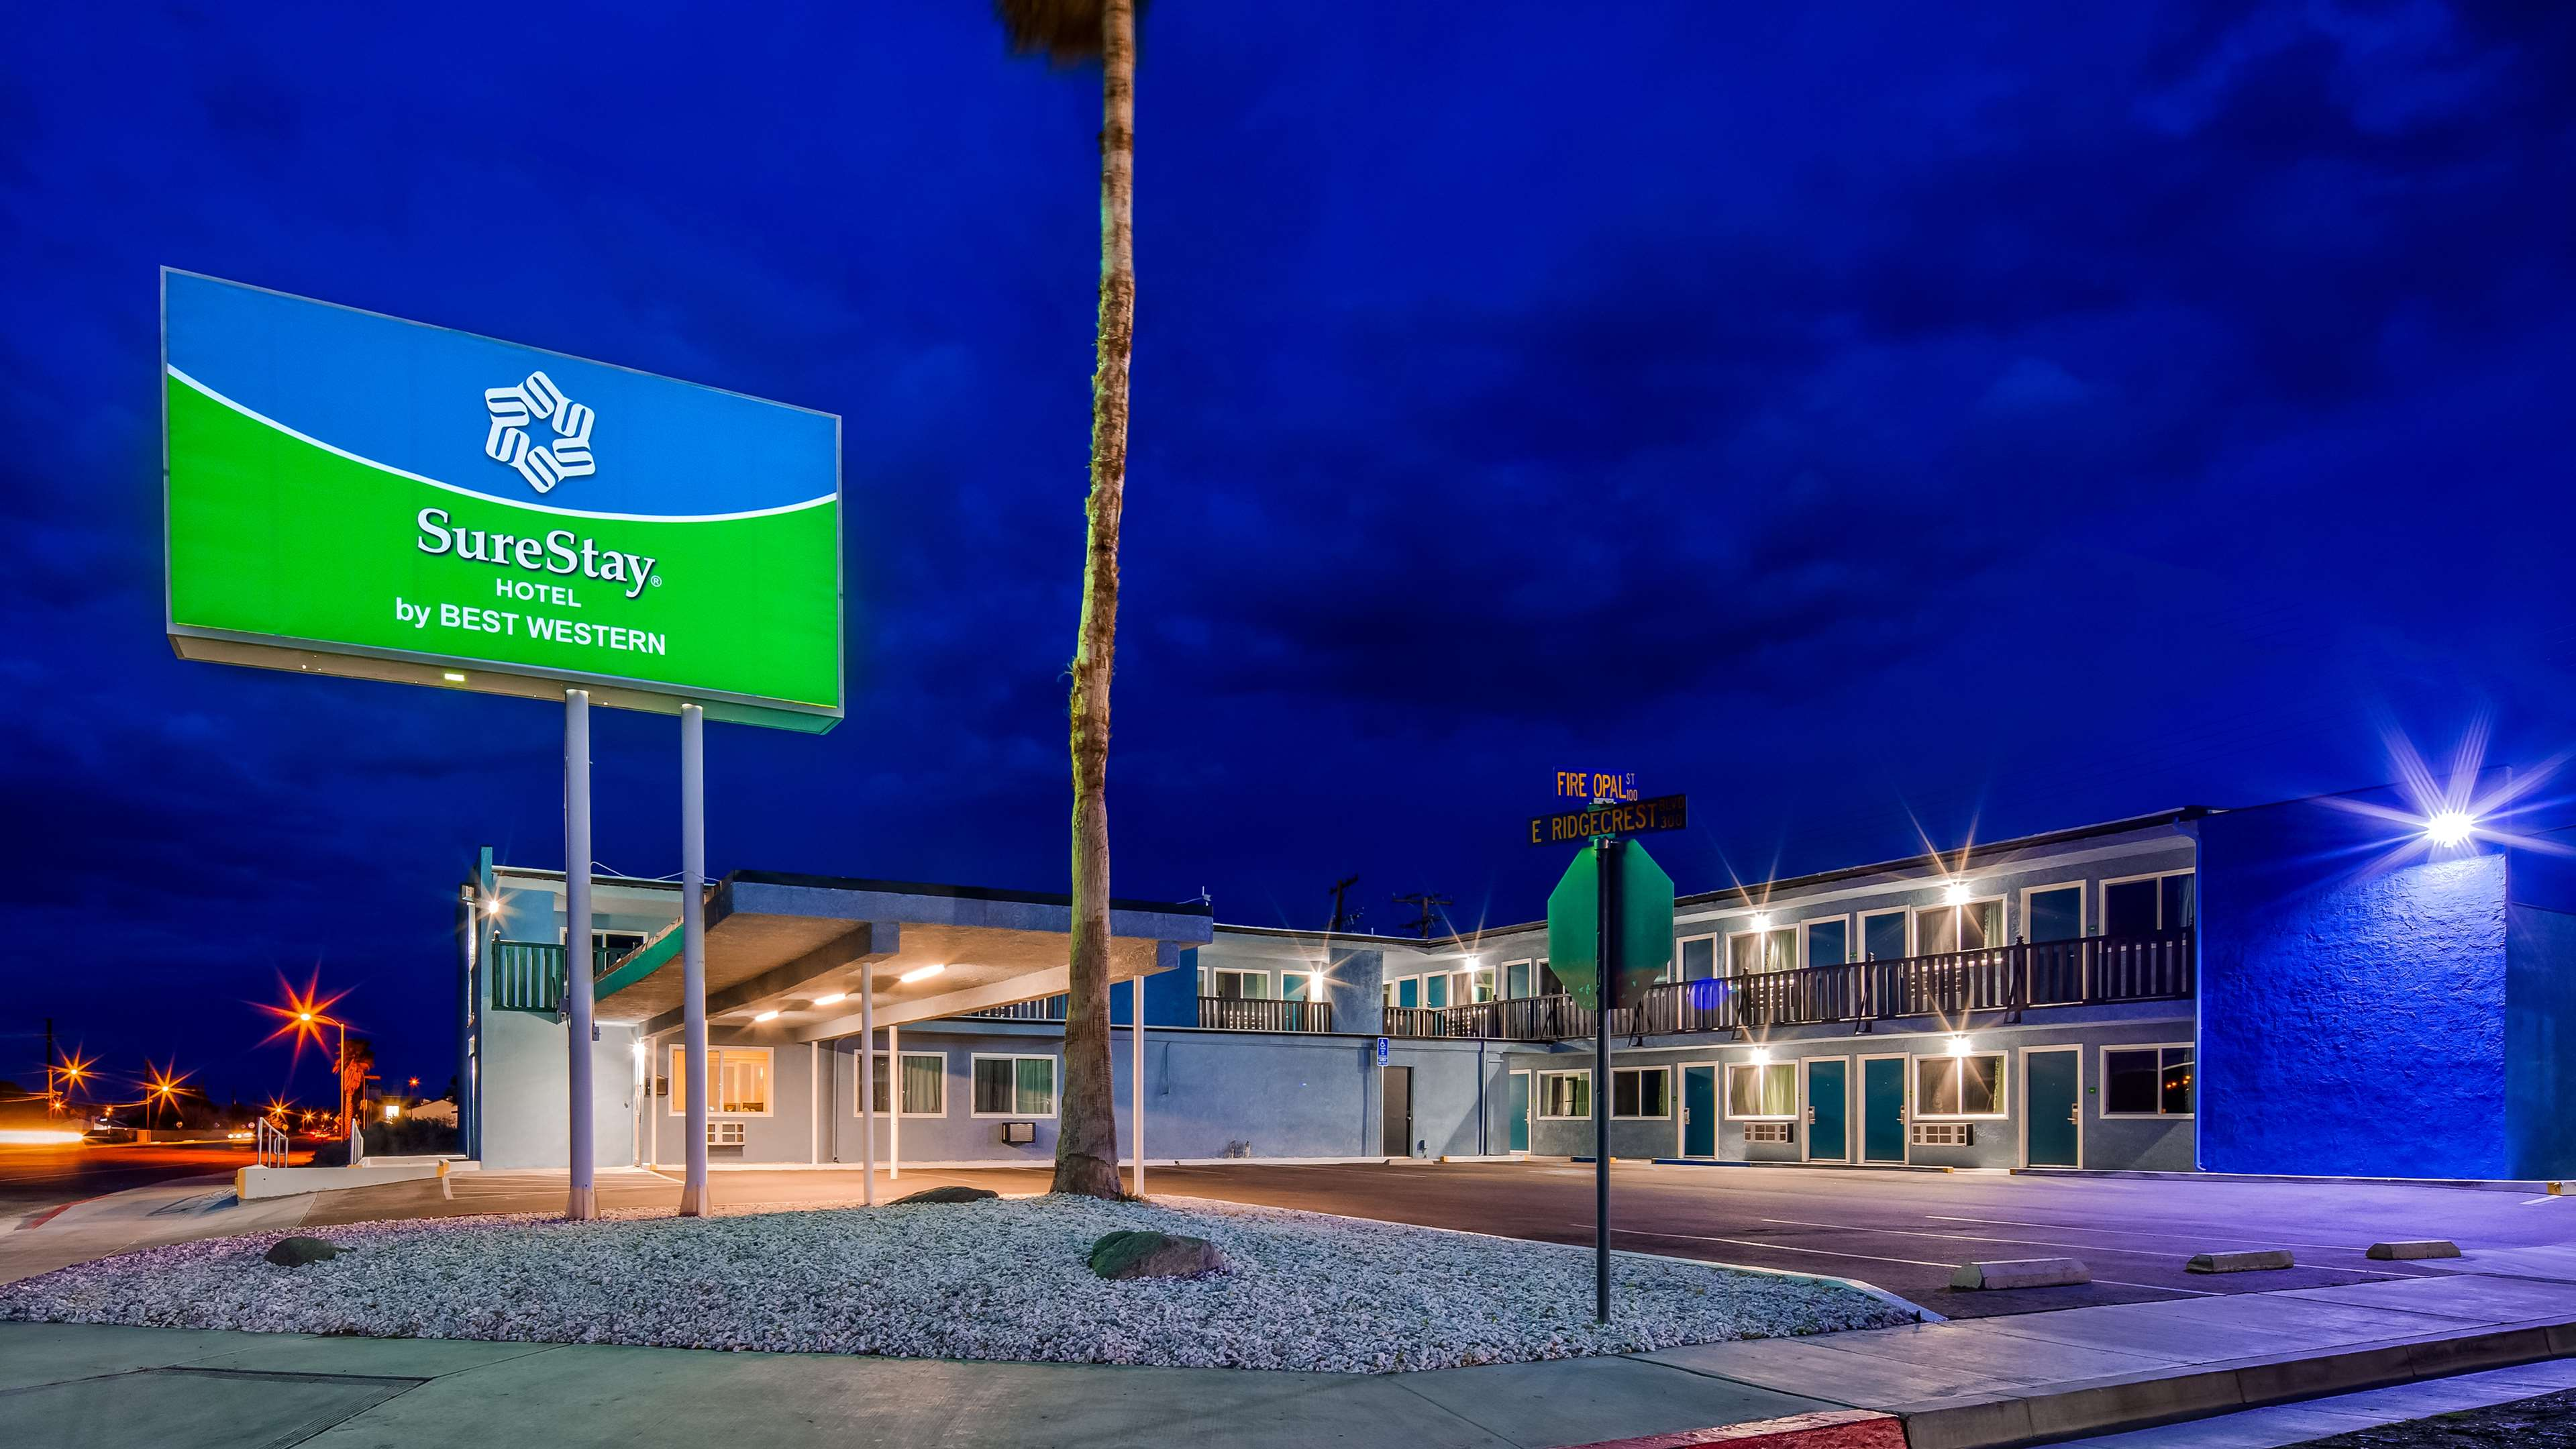 SureStay Hotel by Best Western Ridgecrest image 18